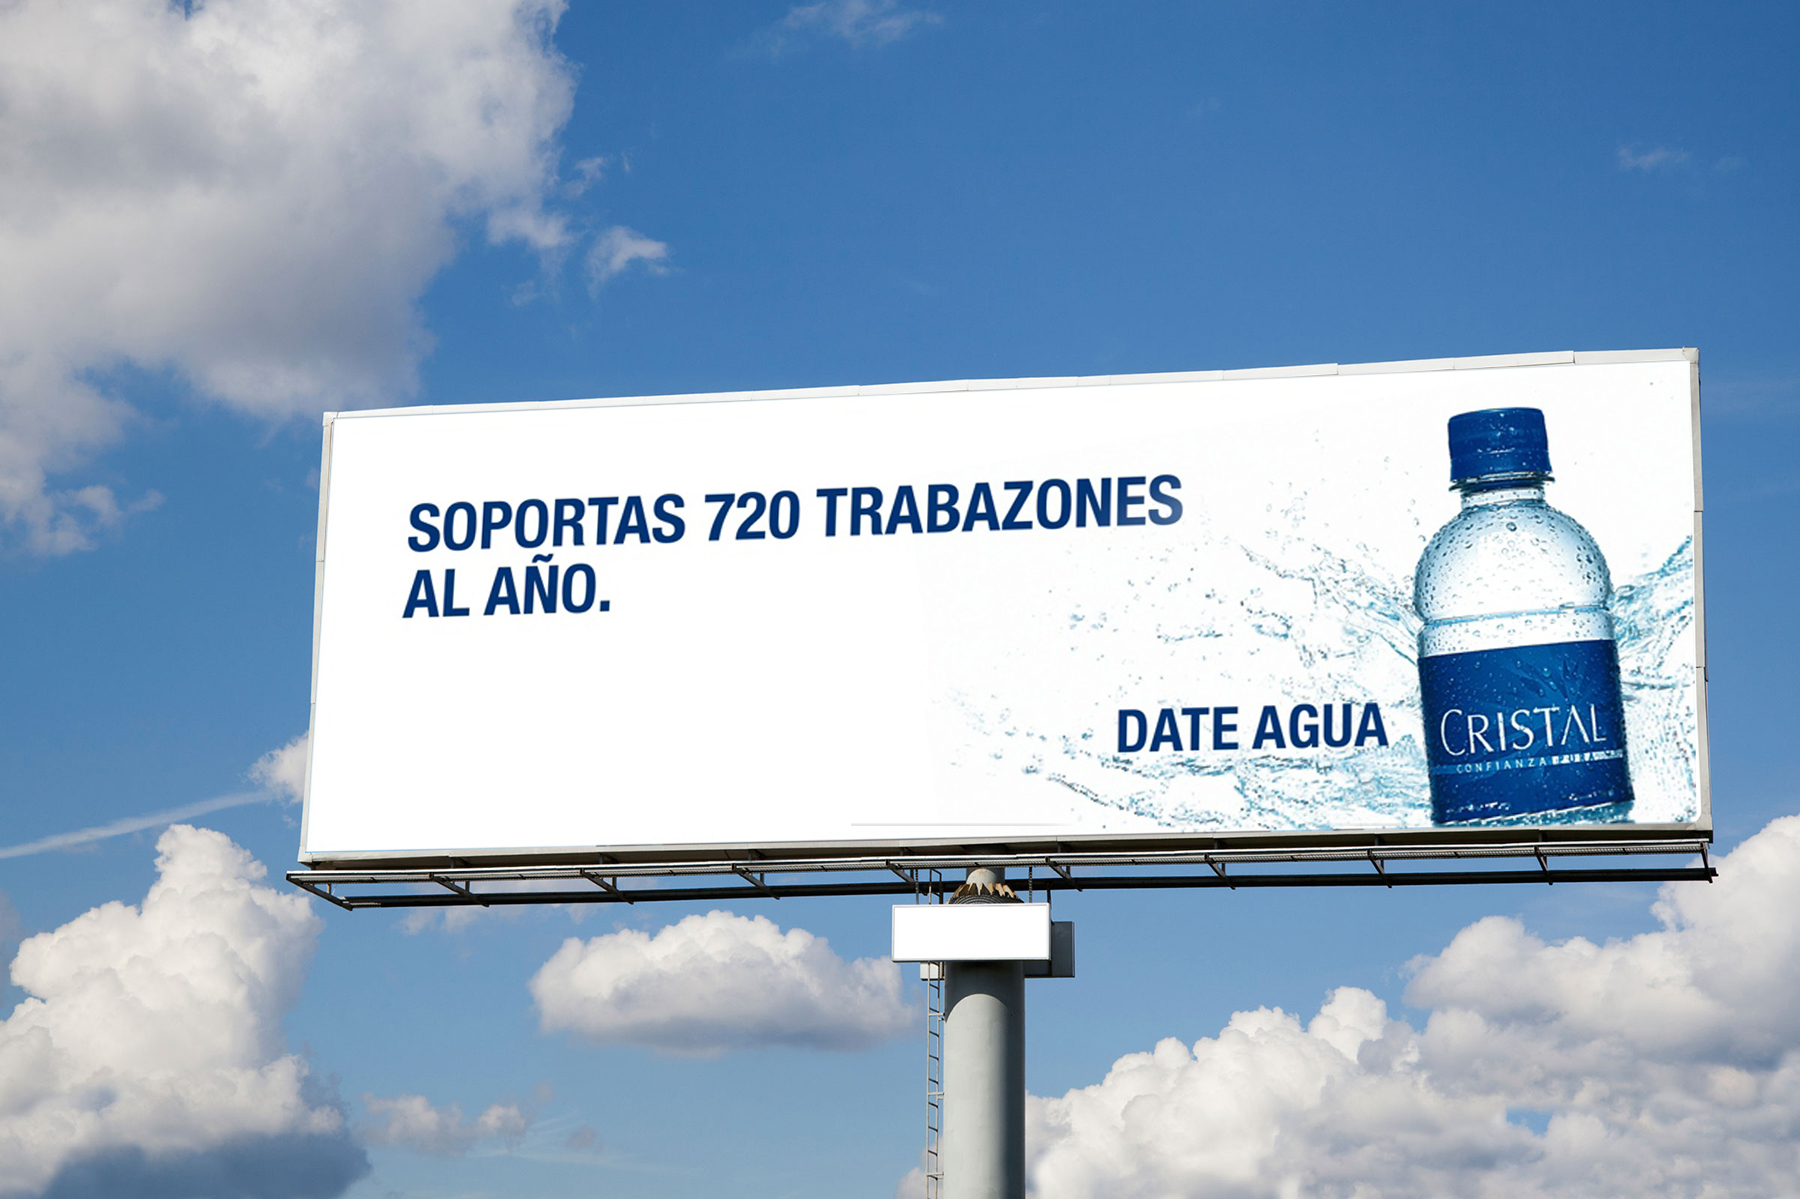 High-traffic zone Billboard:  You endure 720 traffic jams a year. Take a break.